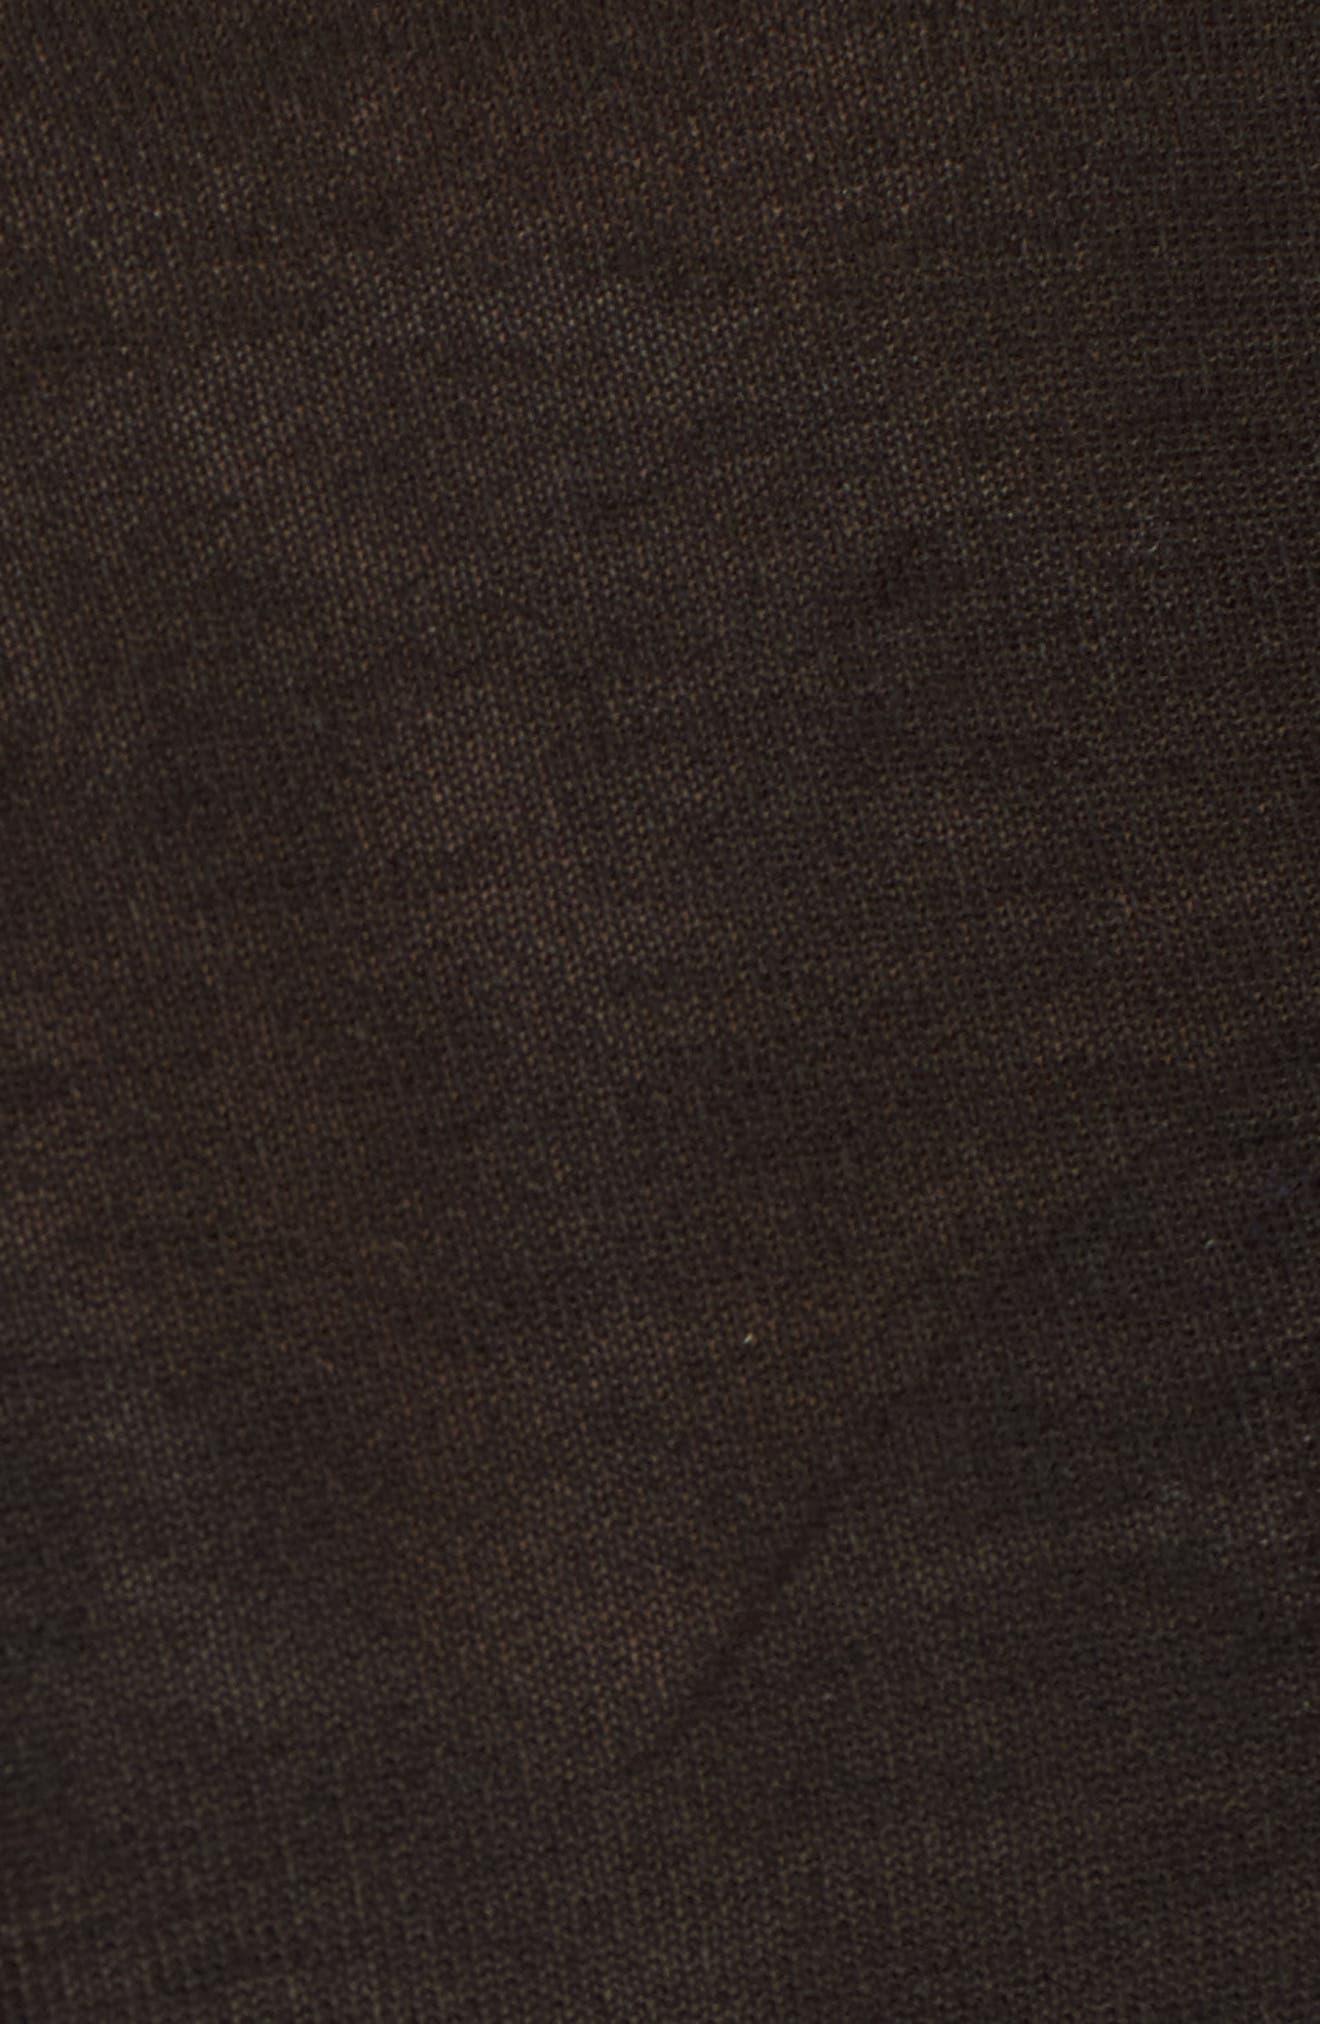 Tencel<sup>®</sup> Lyocell Knit Sweater,                             Alternate thumbnail 5, color,                             Black